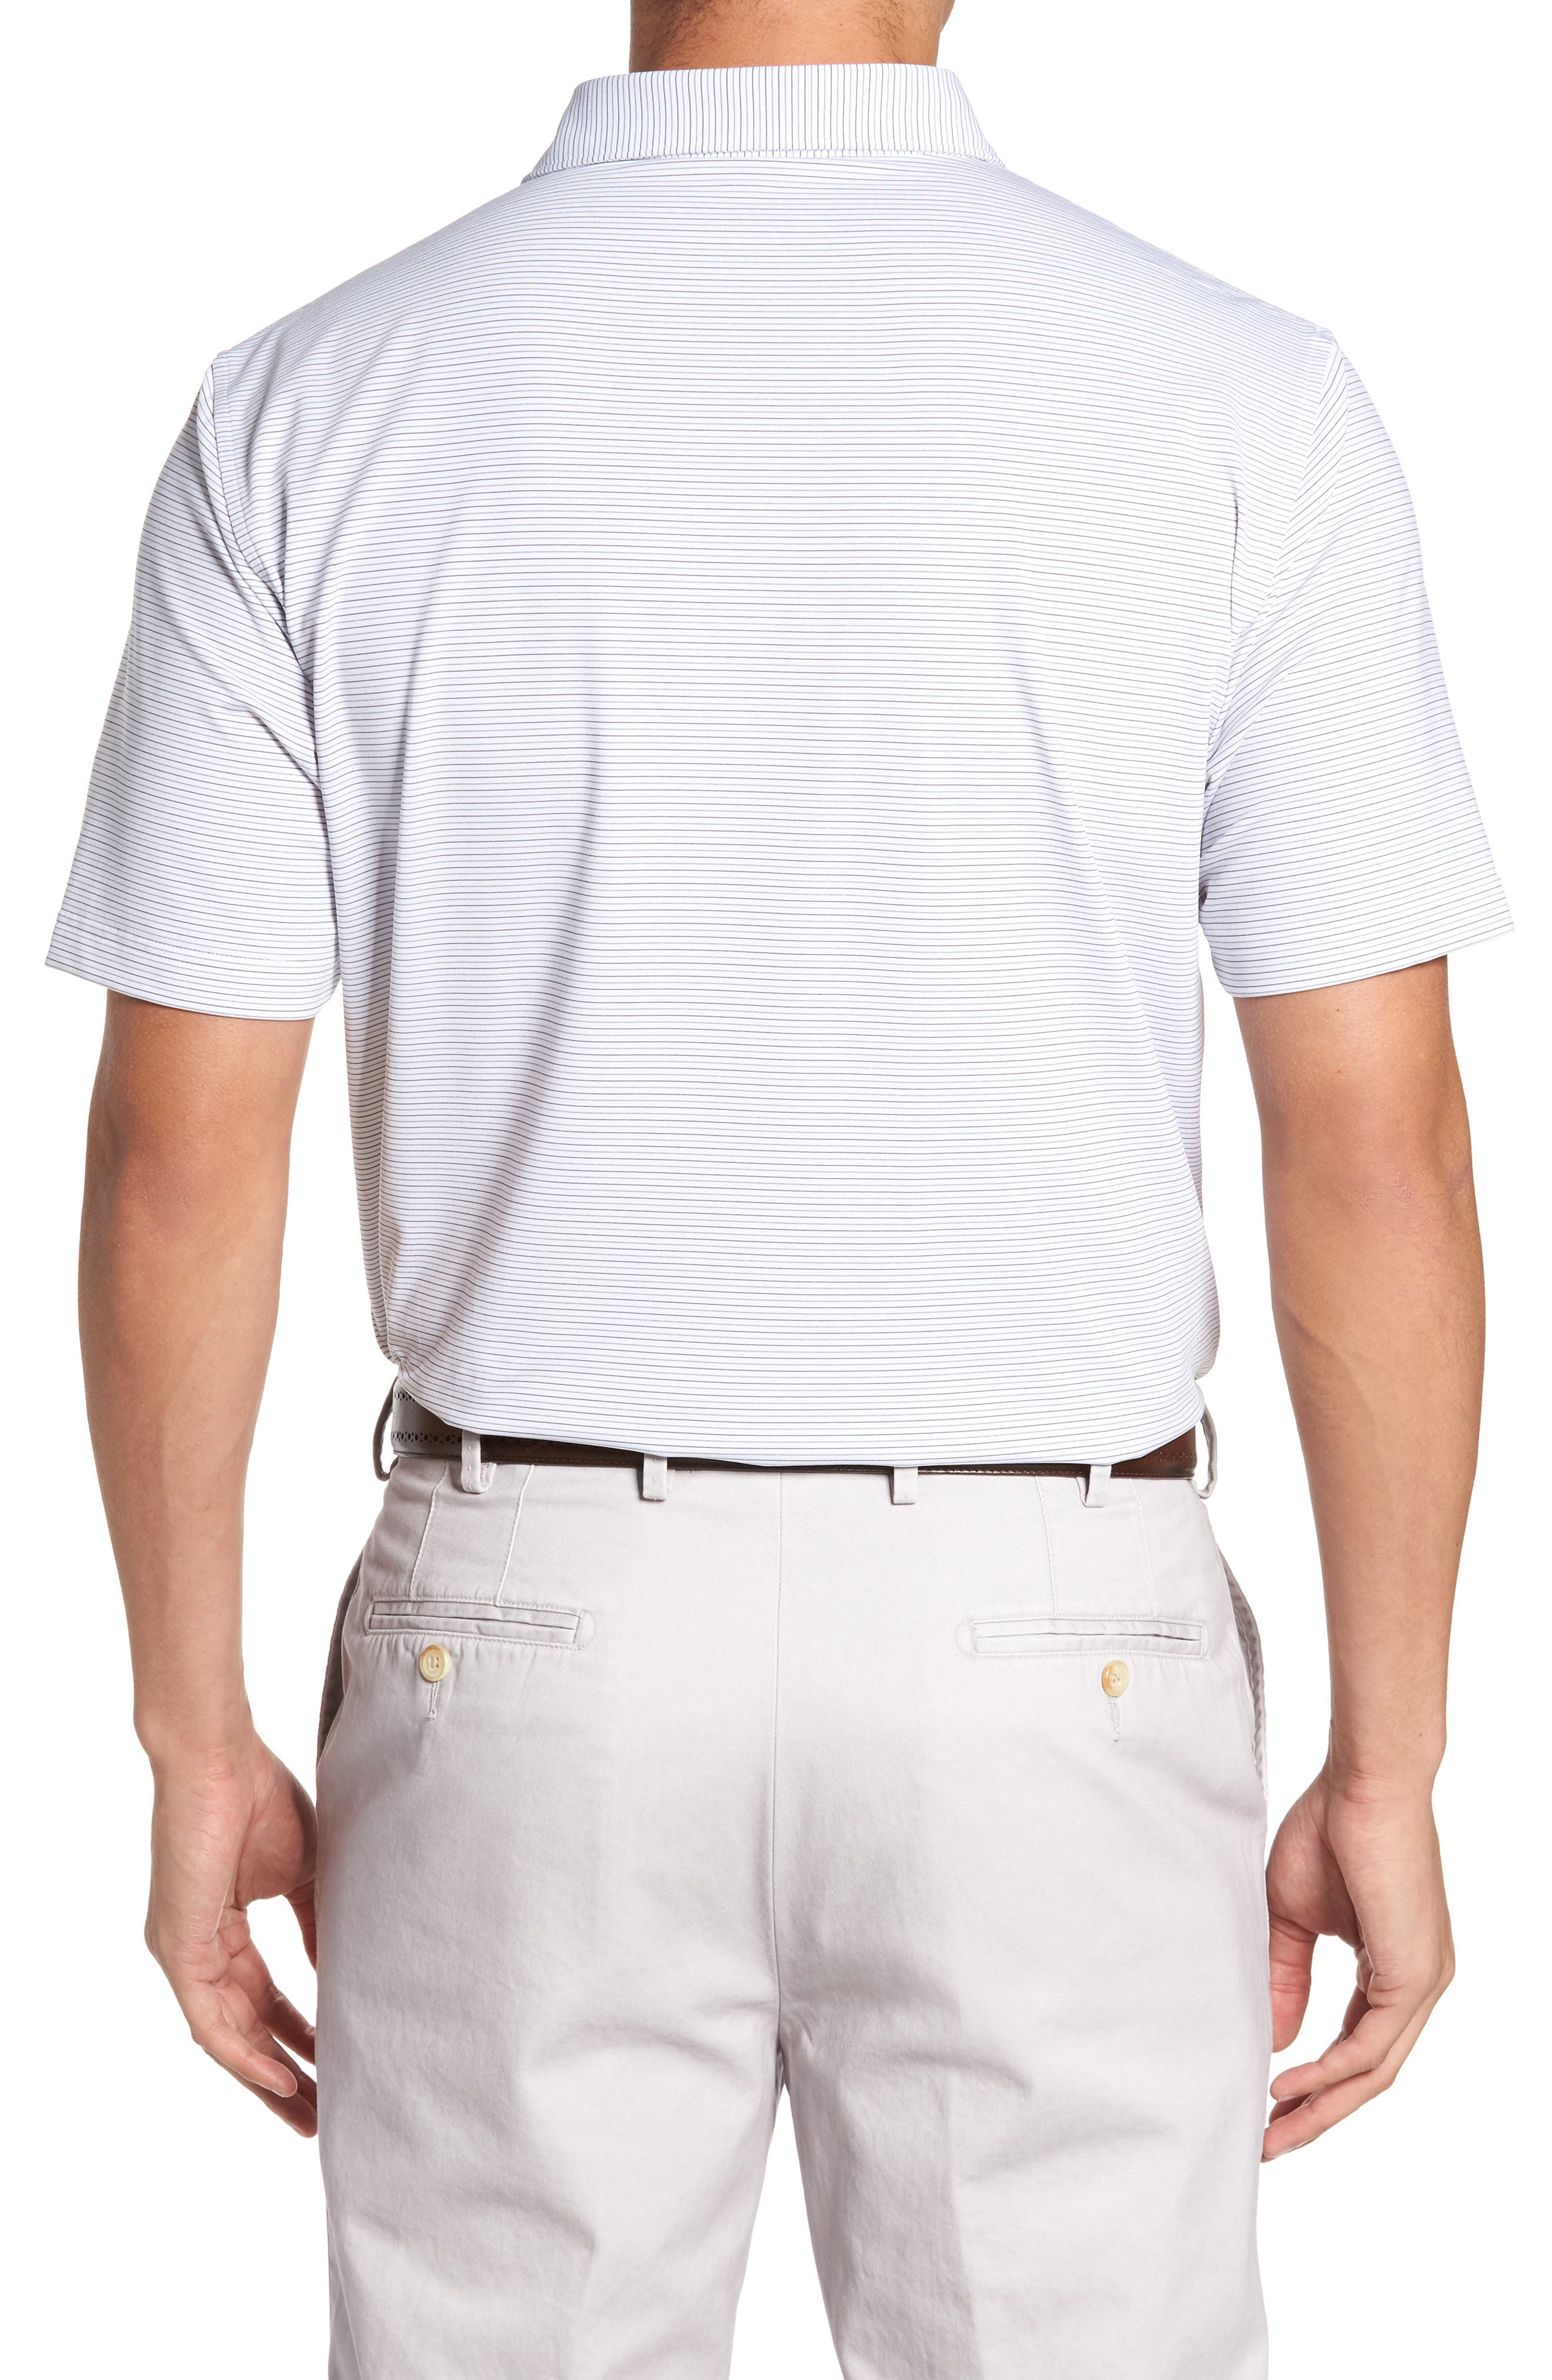 Alternate Image 2  - Peter Millar Chesapeake Stripe Stretch Jersey Polo